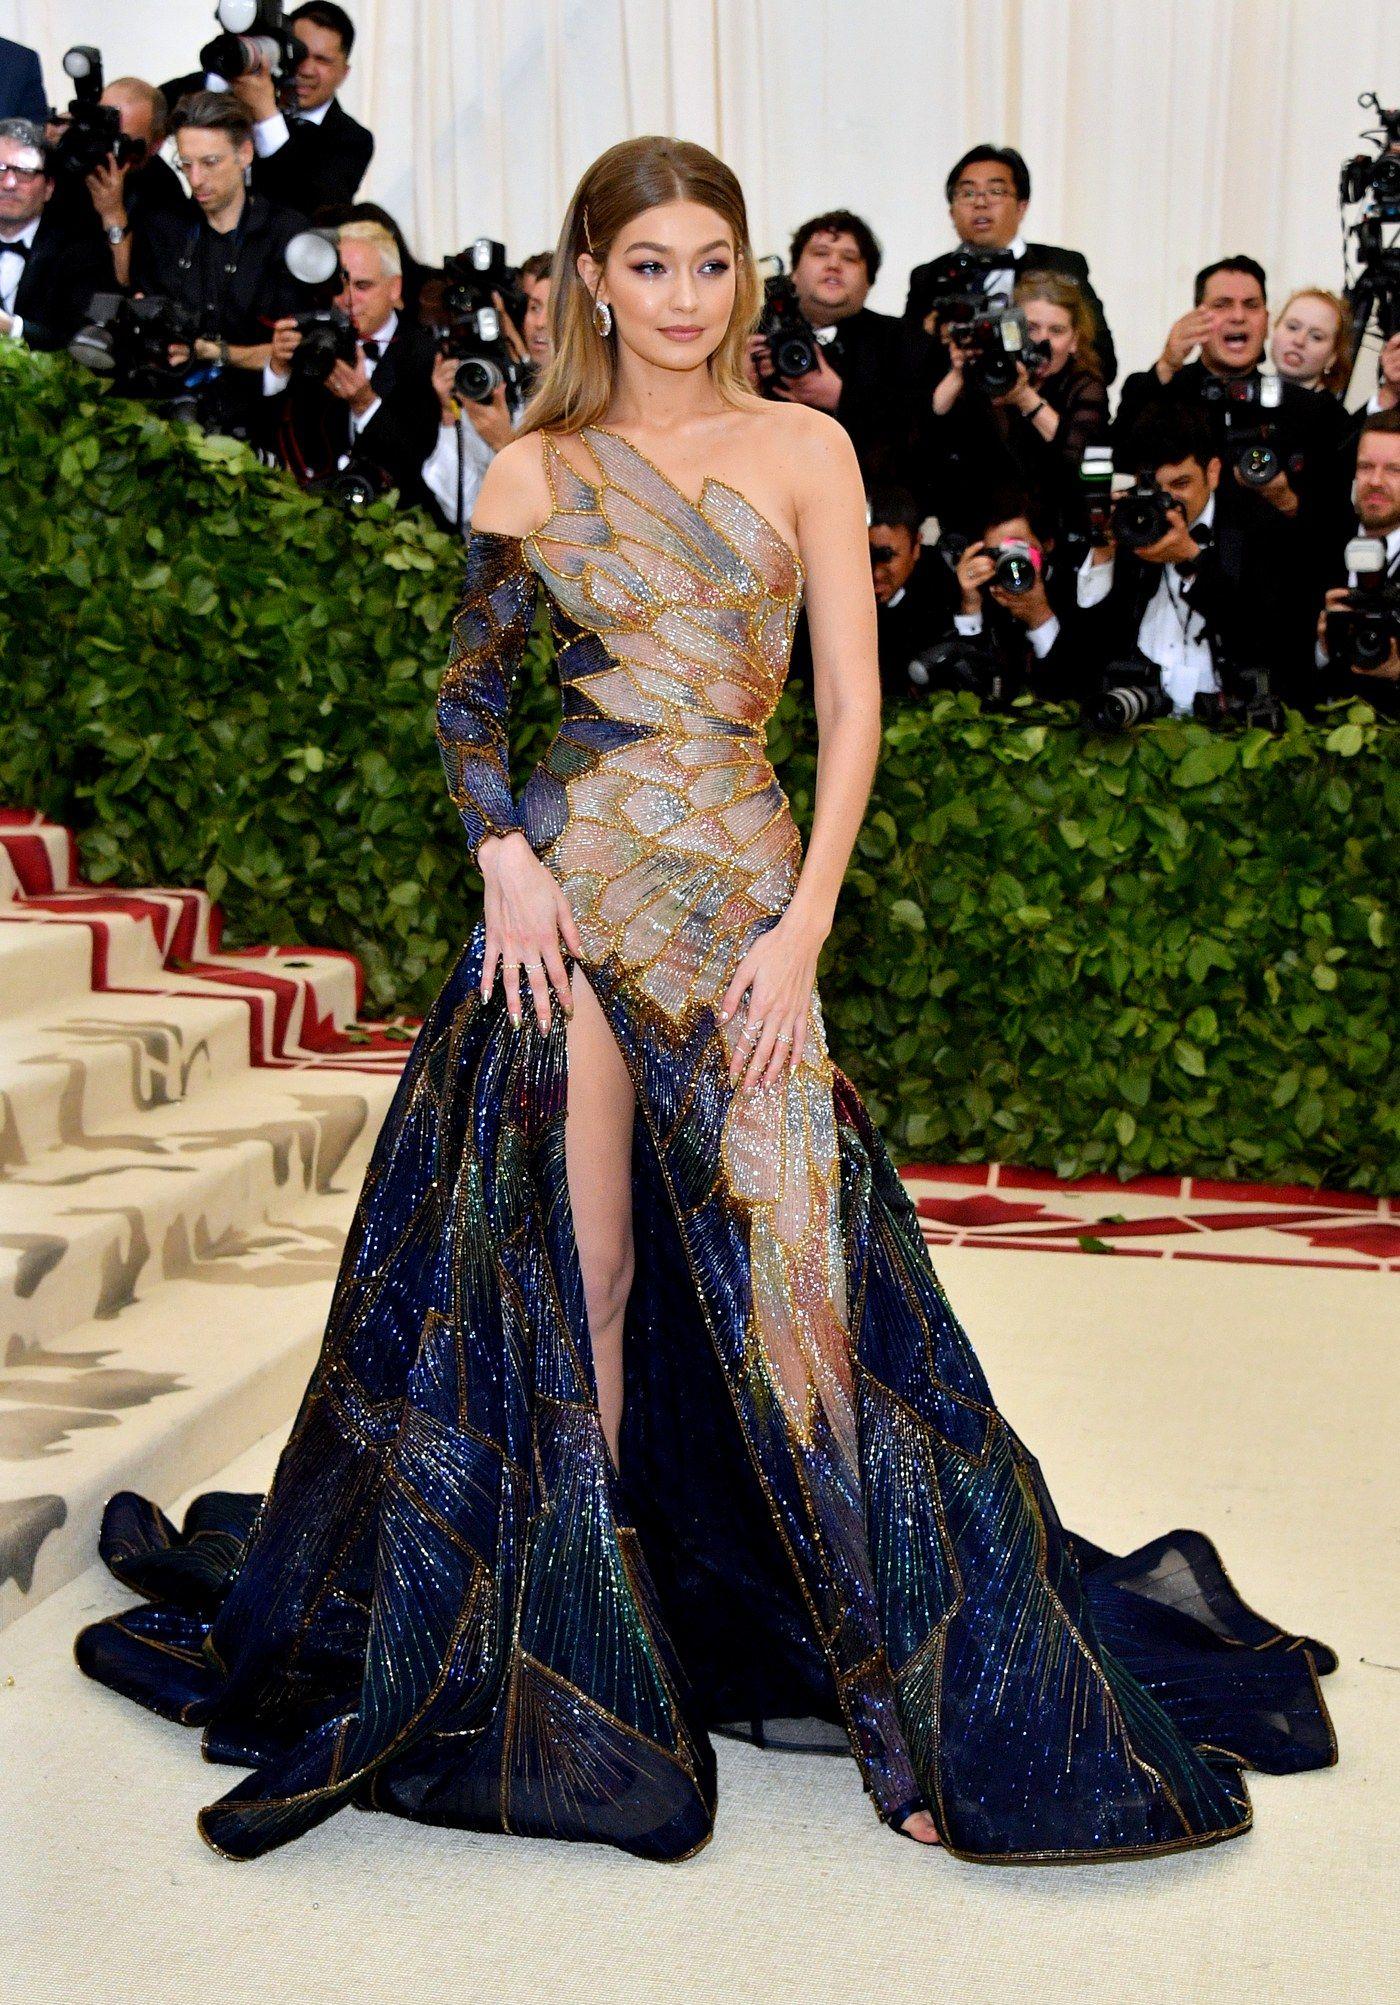 Of Course Katy Perry Delivers The Met S Most Meme Worthy Look Met Gala Dresses Met Gala Outfits Gala Outfit [ 2005 x 1400 Pixel ]